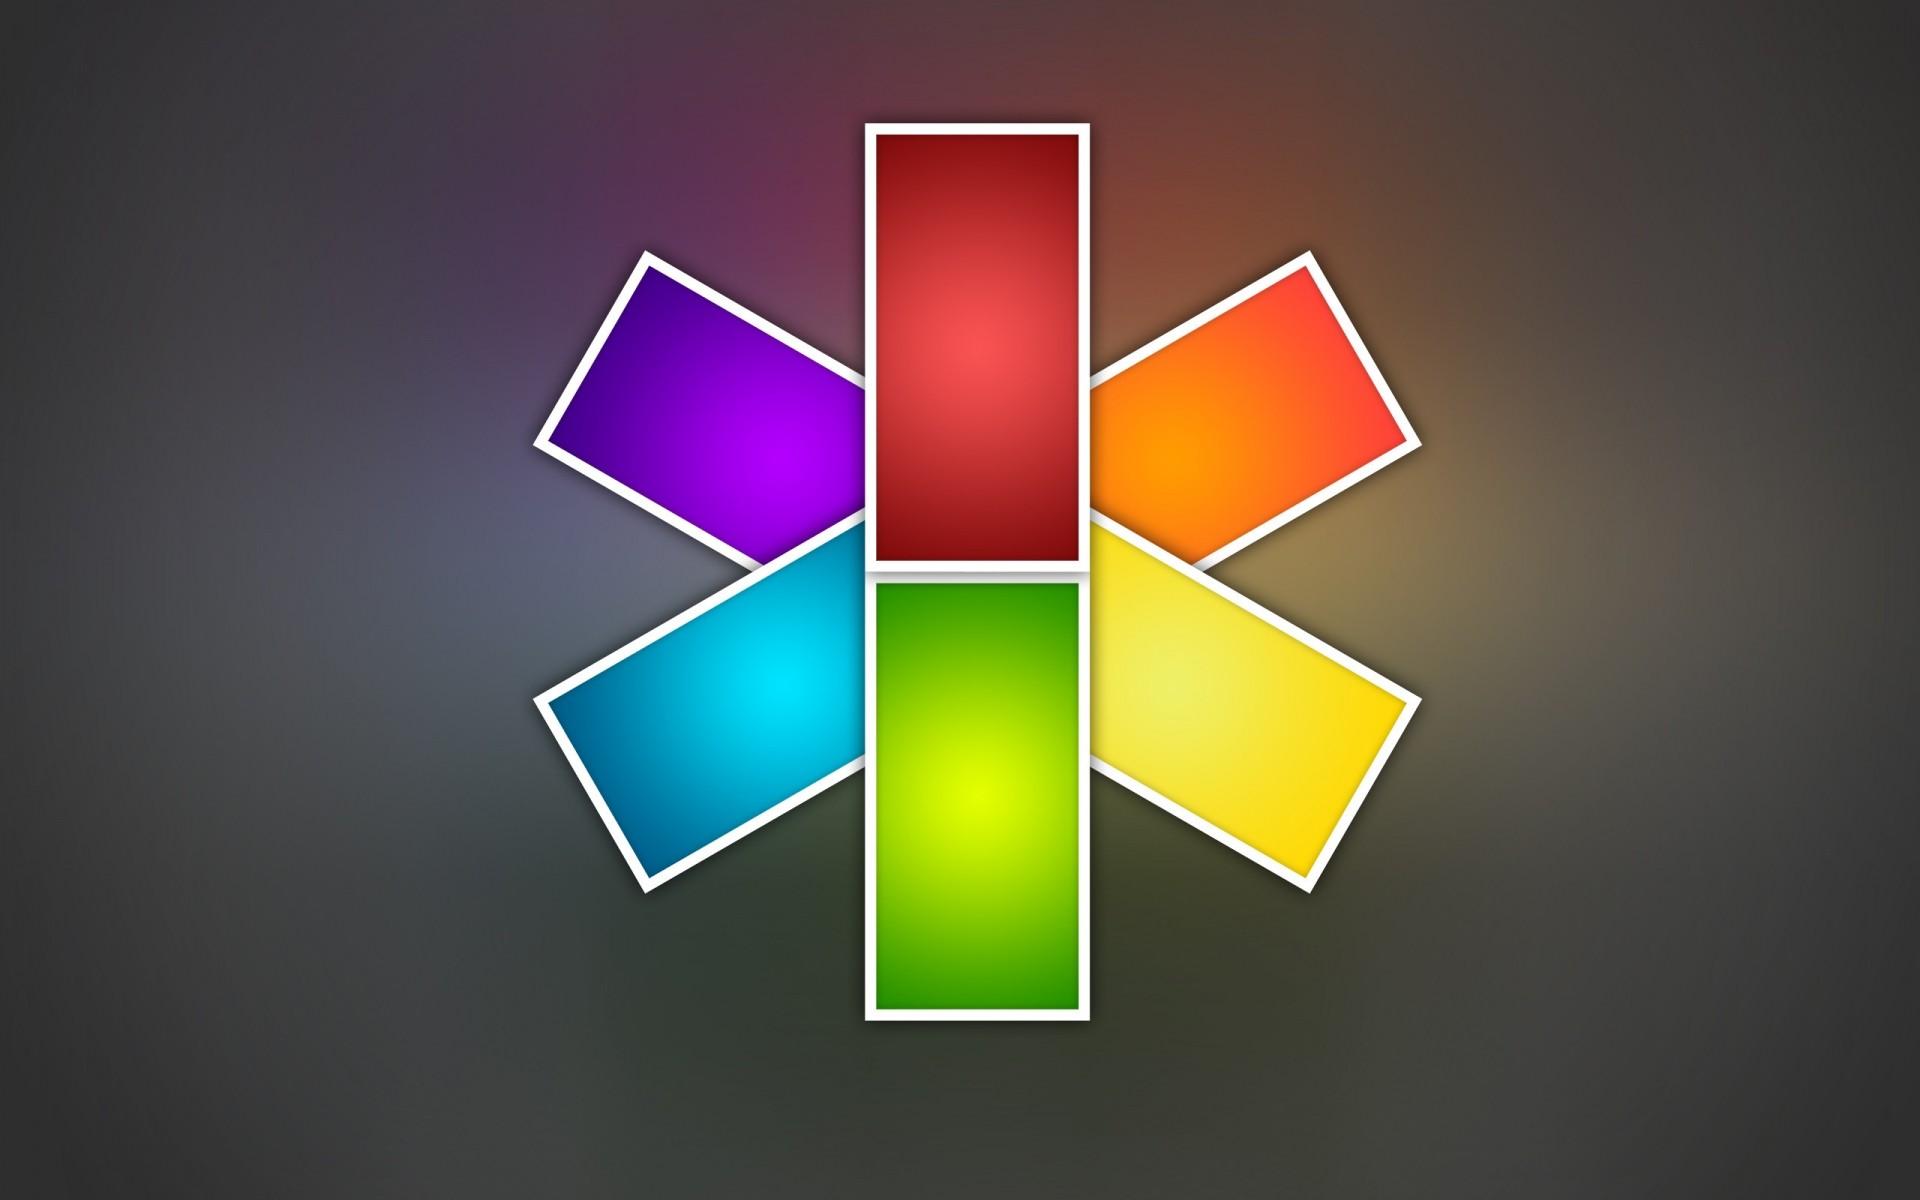 Rainbow 360 Desktop Wallpapers For Free